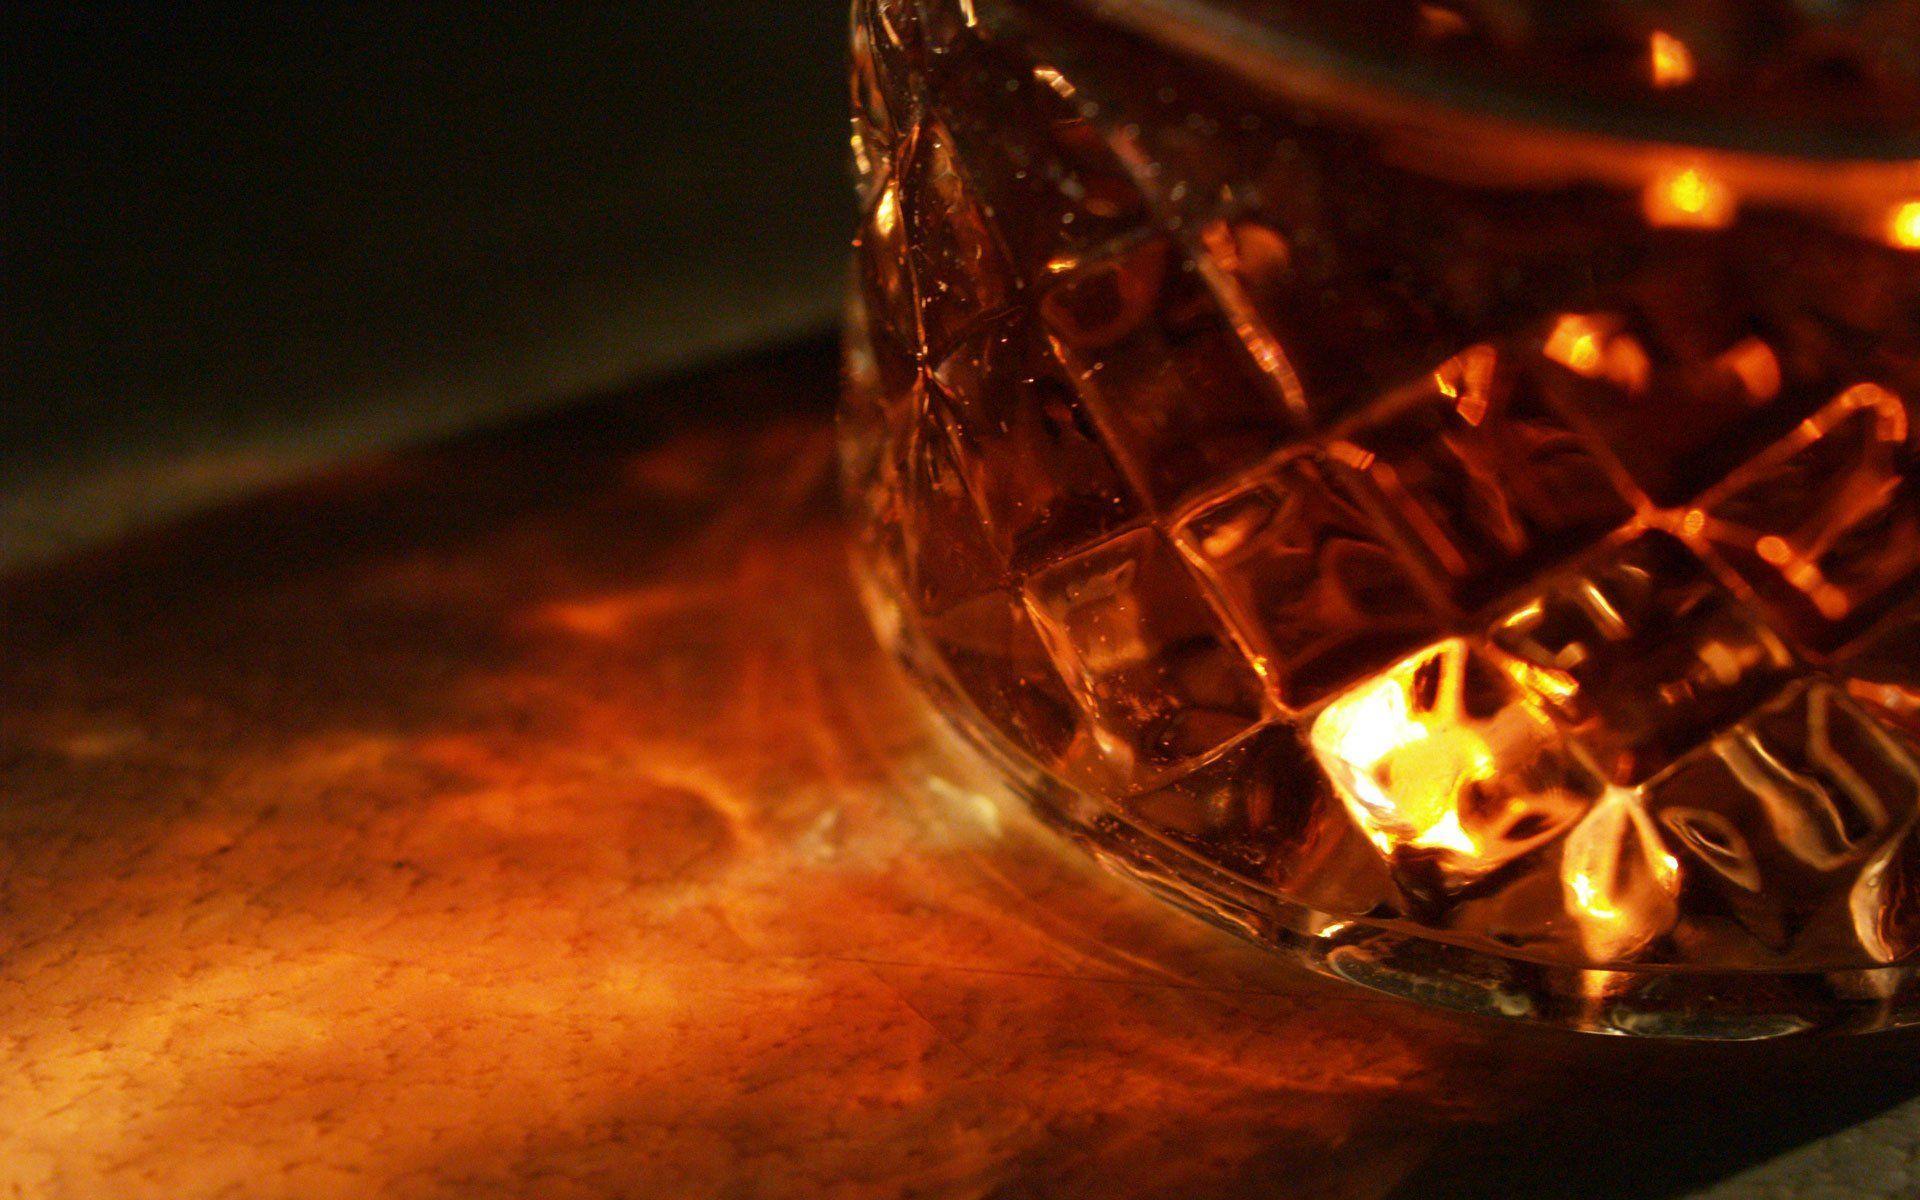 wallpaper whiskey bourbon alcohol - photo #8